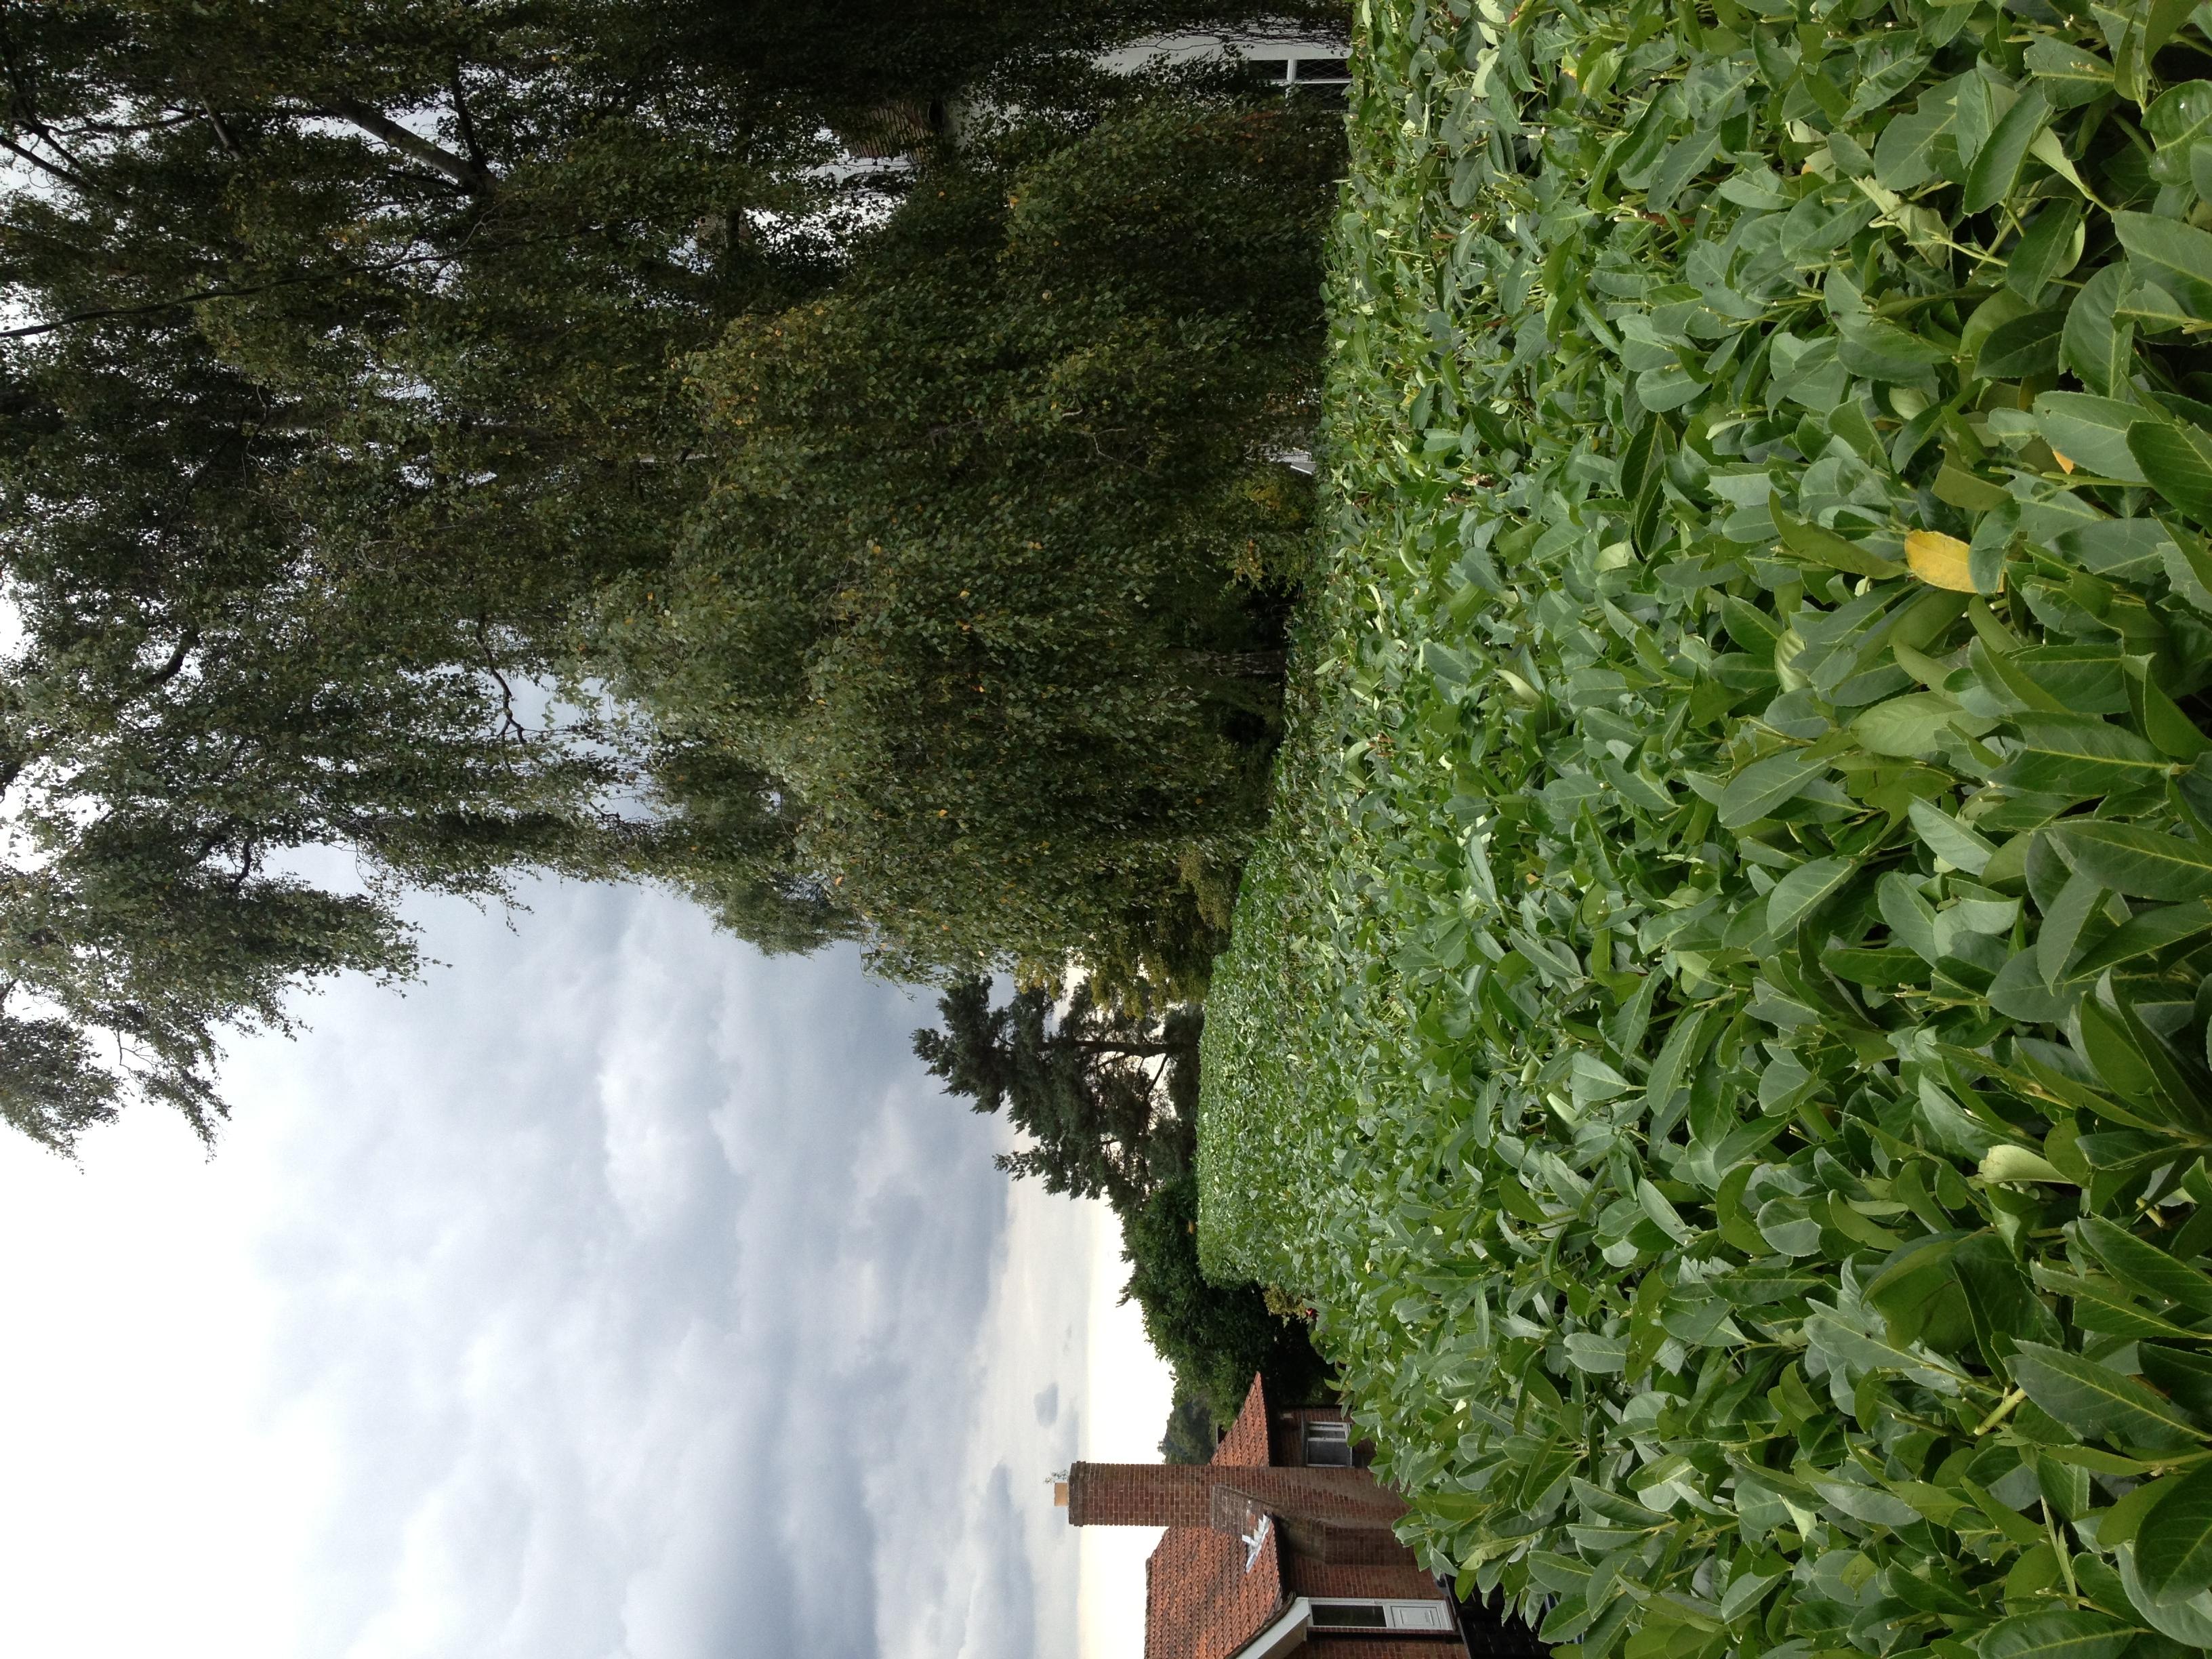 Greenacre_Trees_Landscapes_Hedge trimming 4.JPG